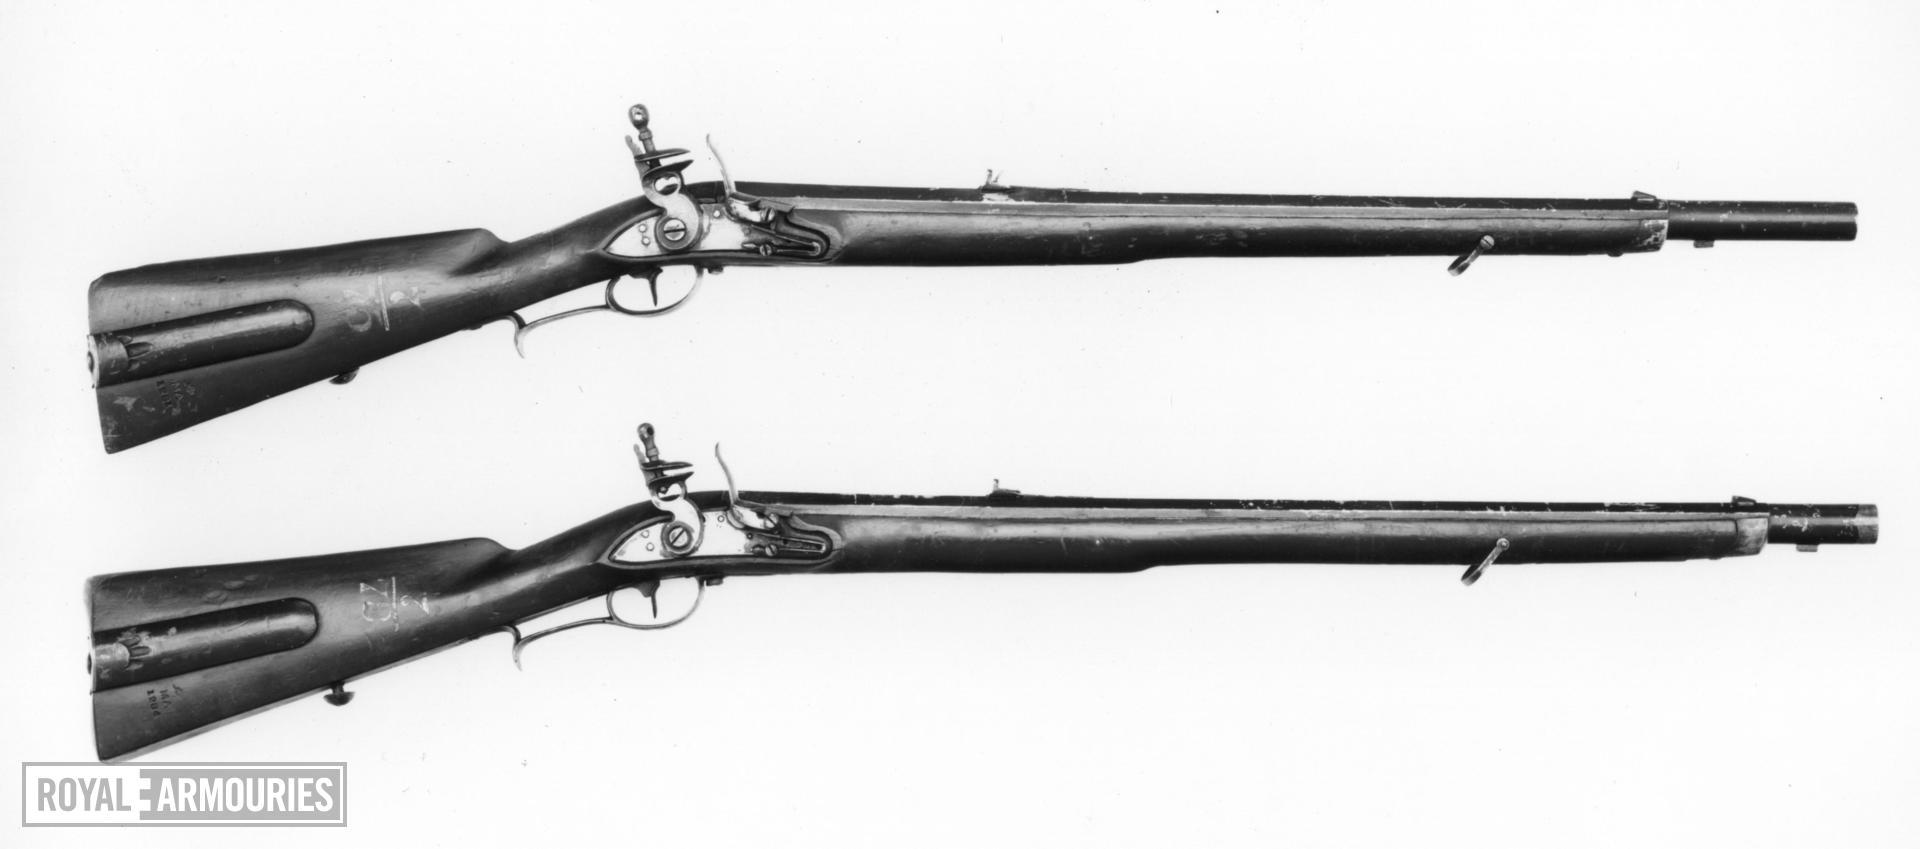 Flintlock muzzle-loading rifle - Jager Model 1807